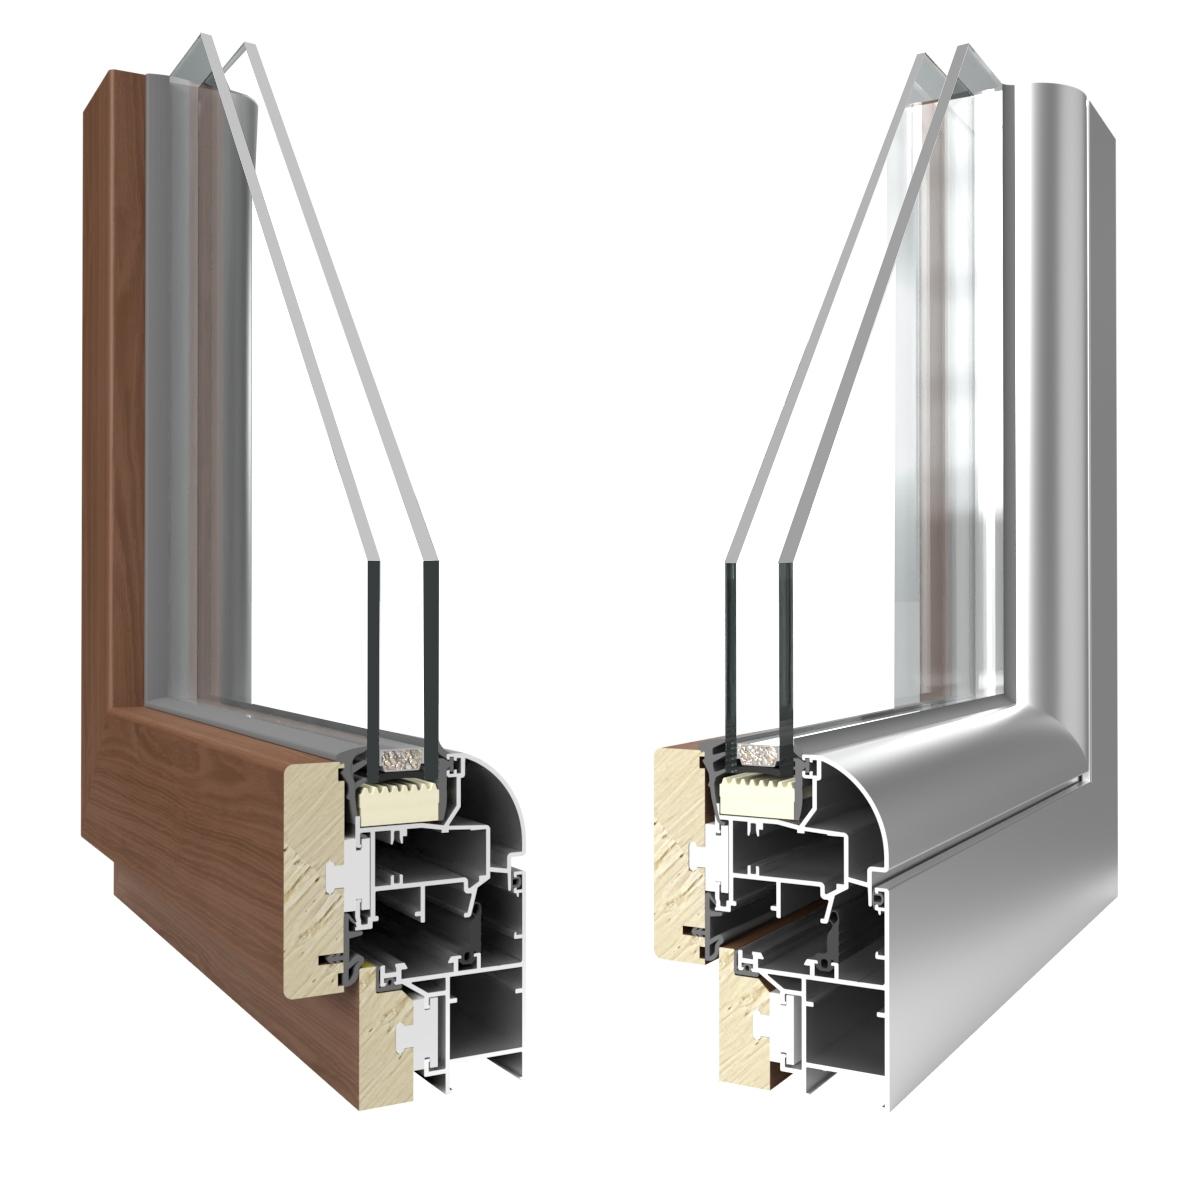 https://www.allpaint.it/wp-content/uploads/2021/07/finestre-alluminio-legno-woodline-allpaint.jpg